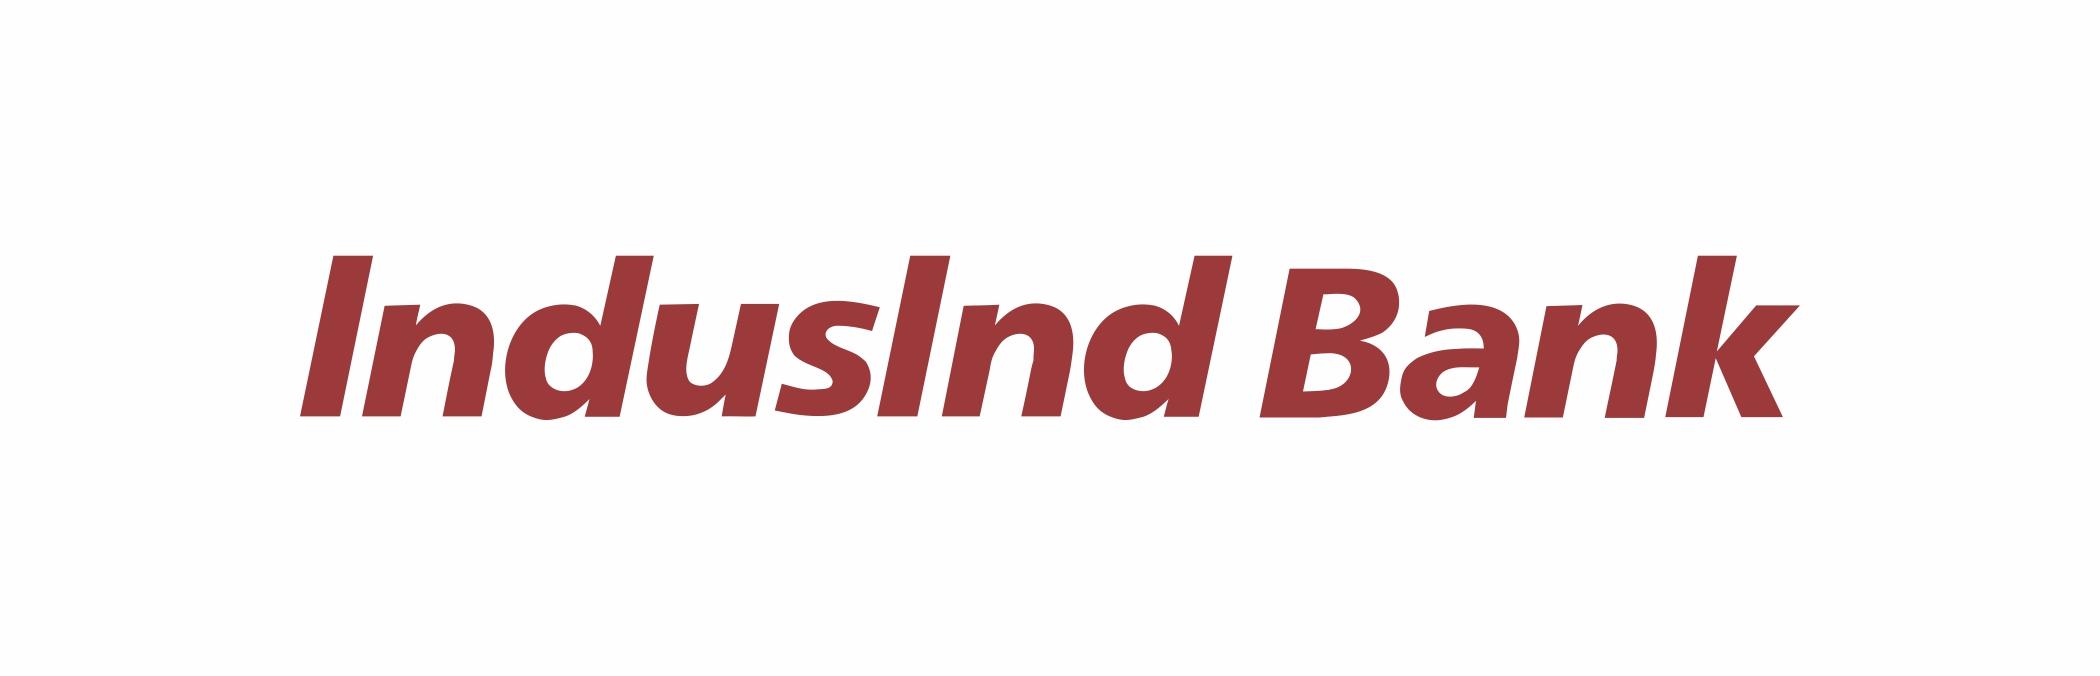 IndusInd Bank,CAMPROAD - logo